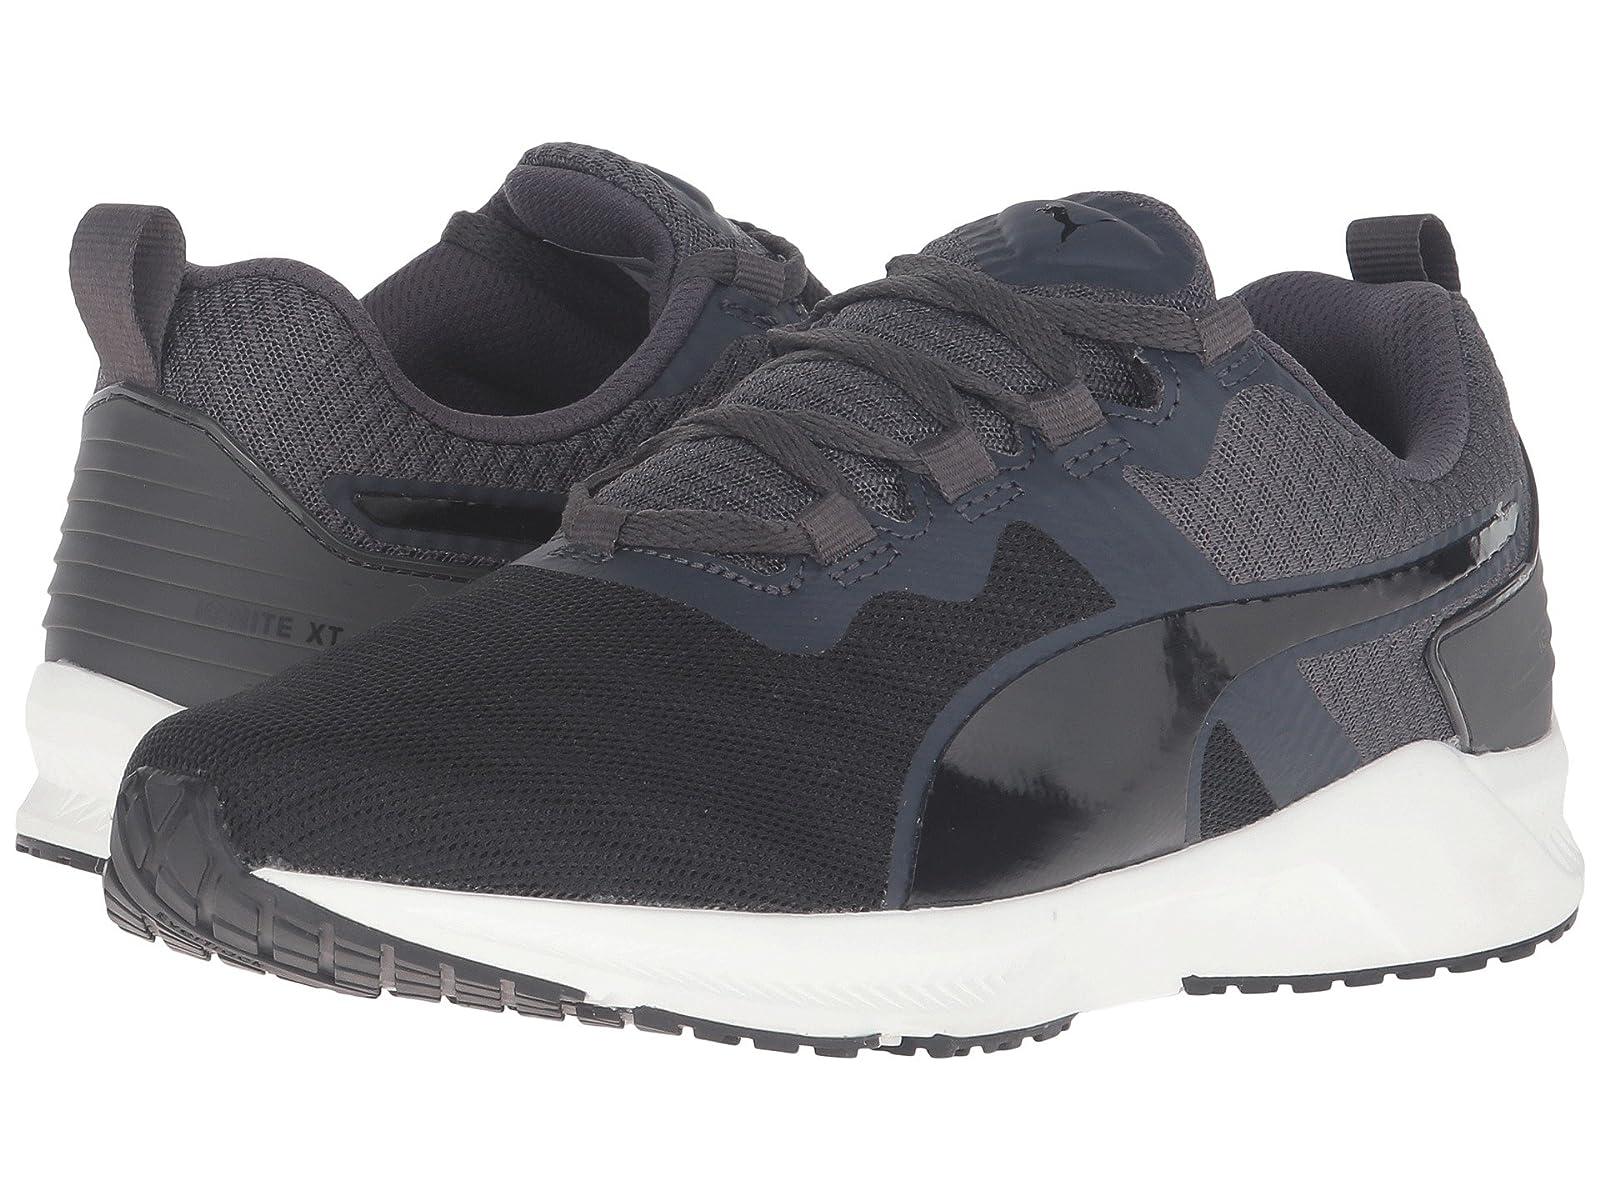 PUMA Ignite XT V2Cheap and distinctive eye-catching shoes